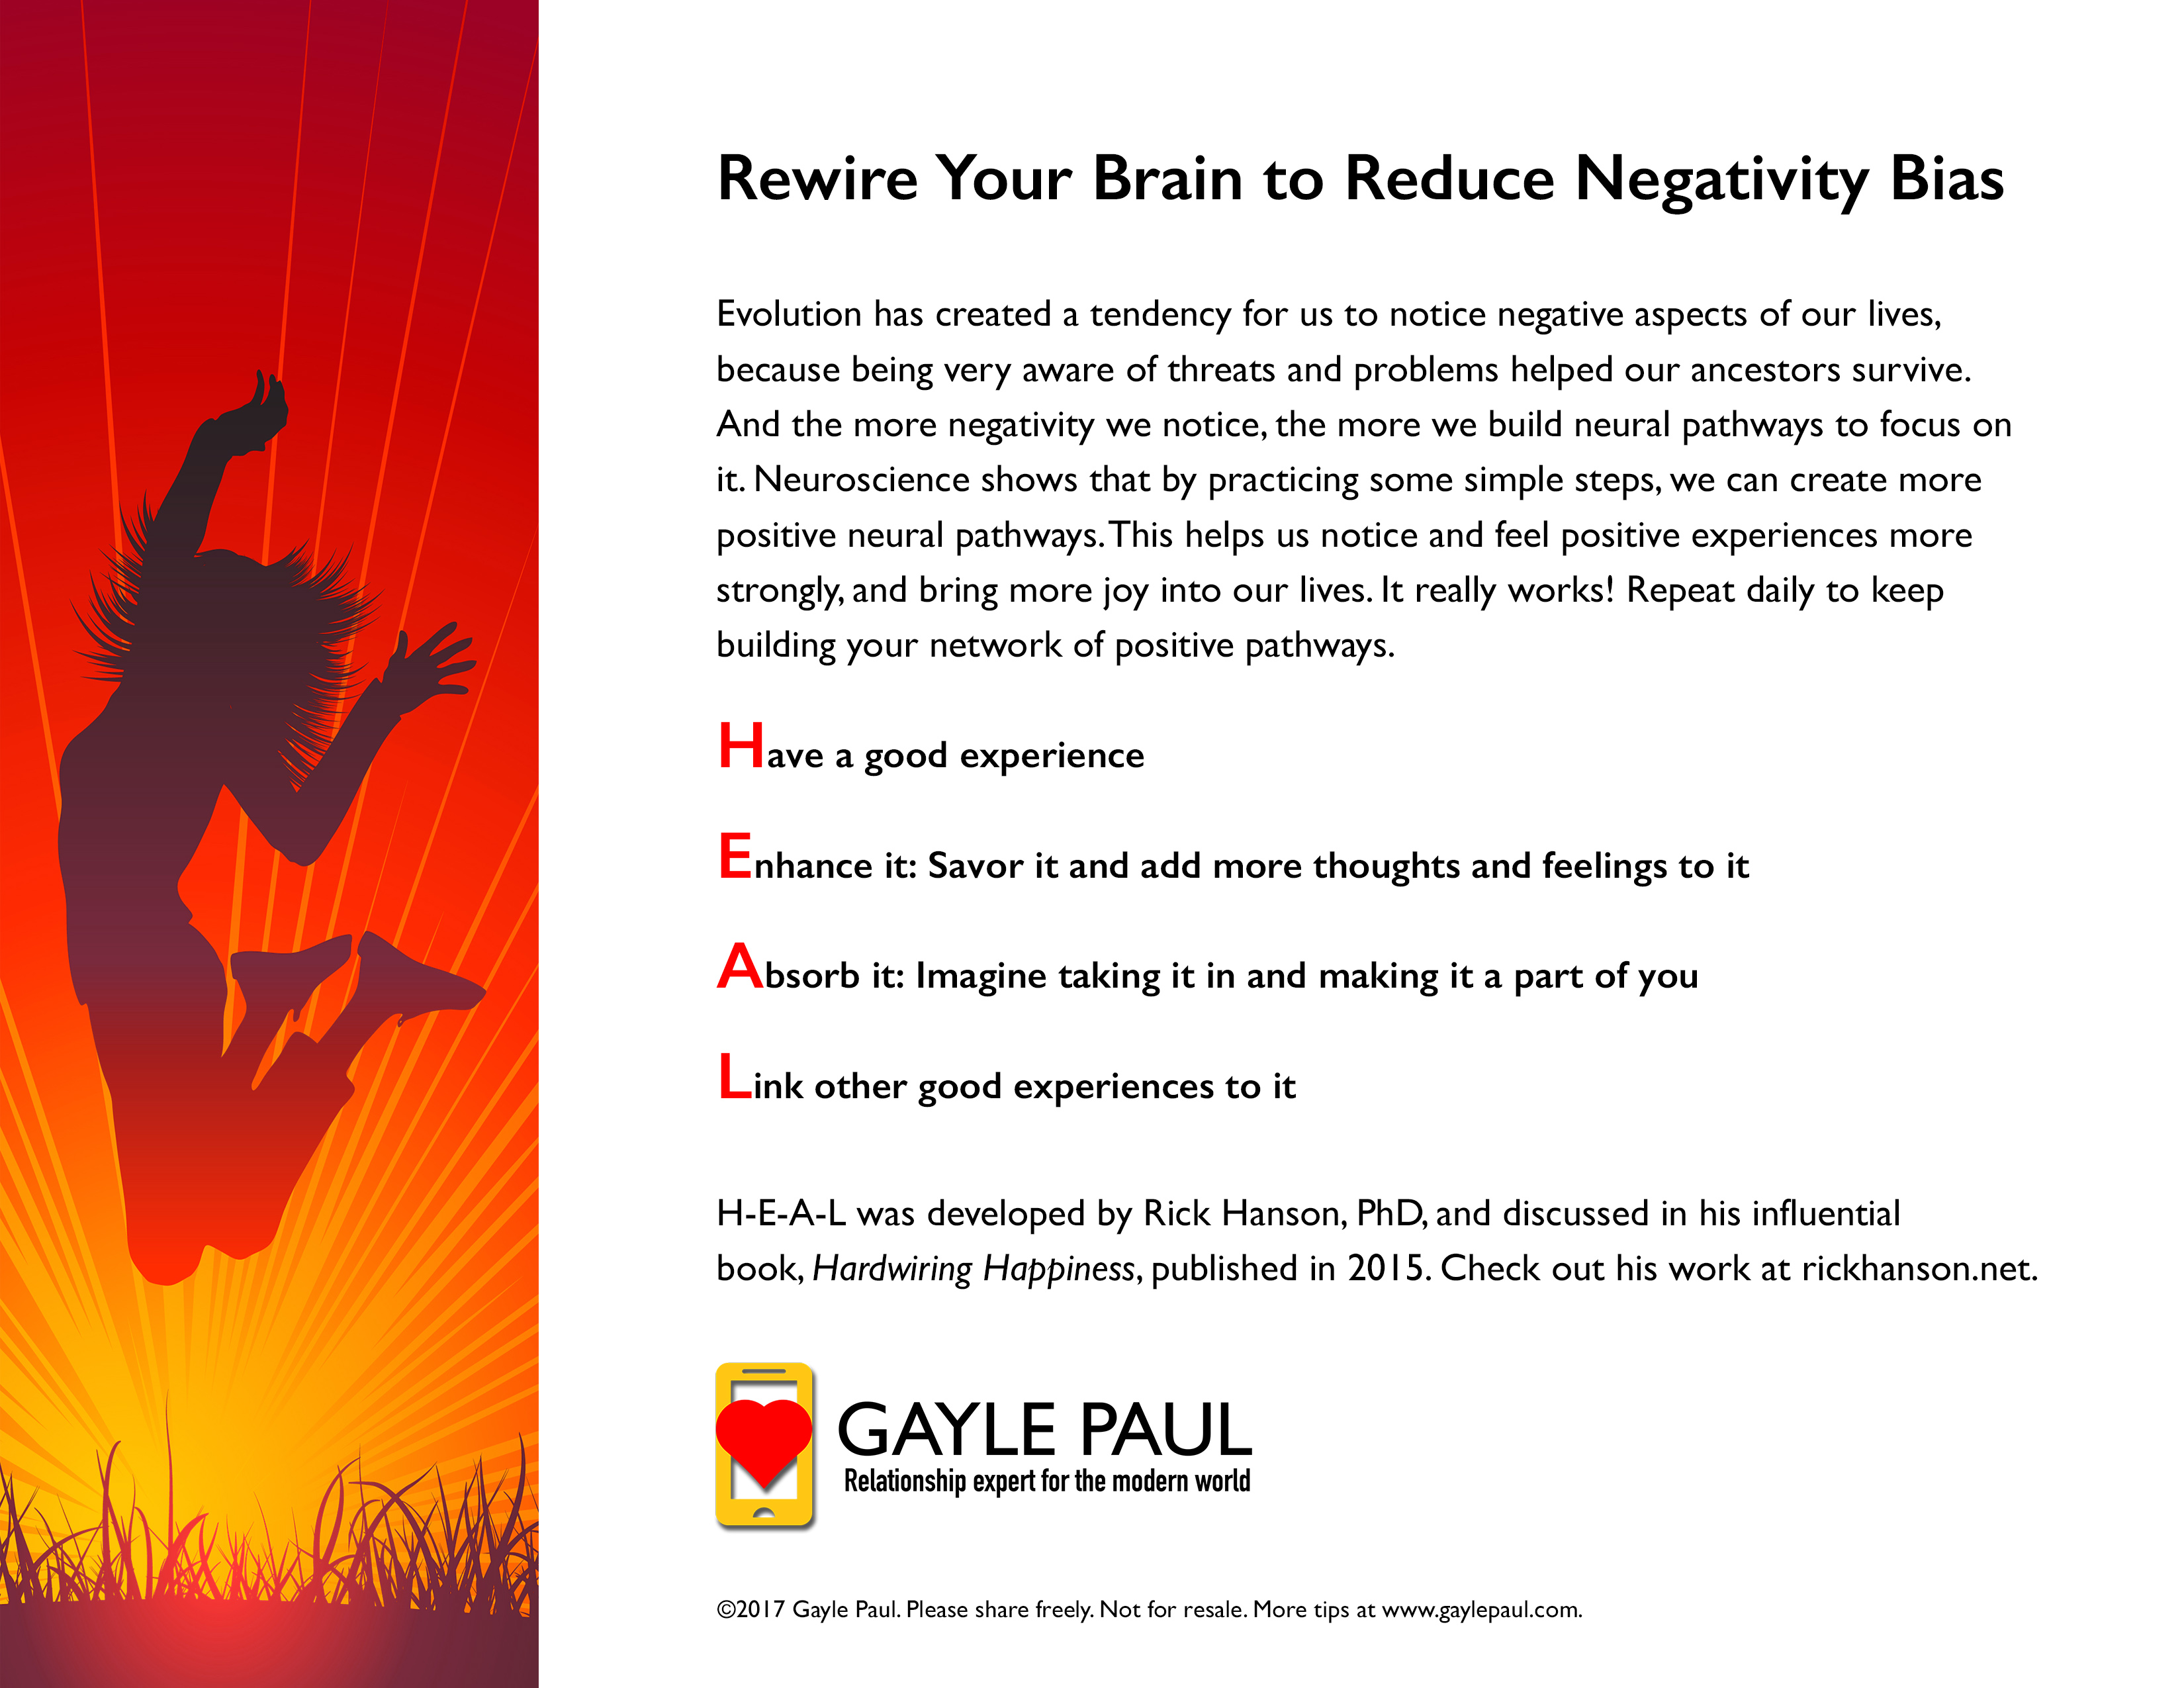 Rewire Your Brain To Reduce Negativity Bias